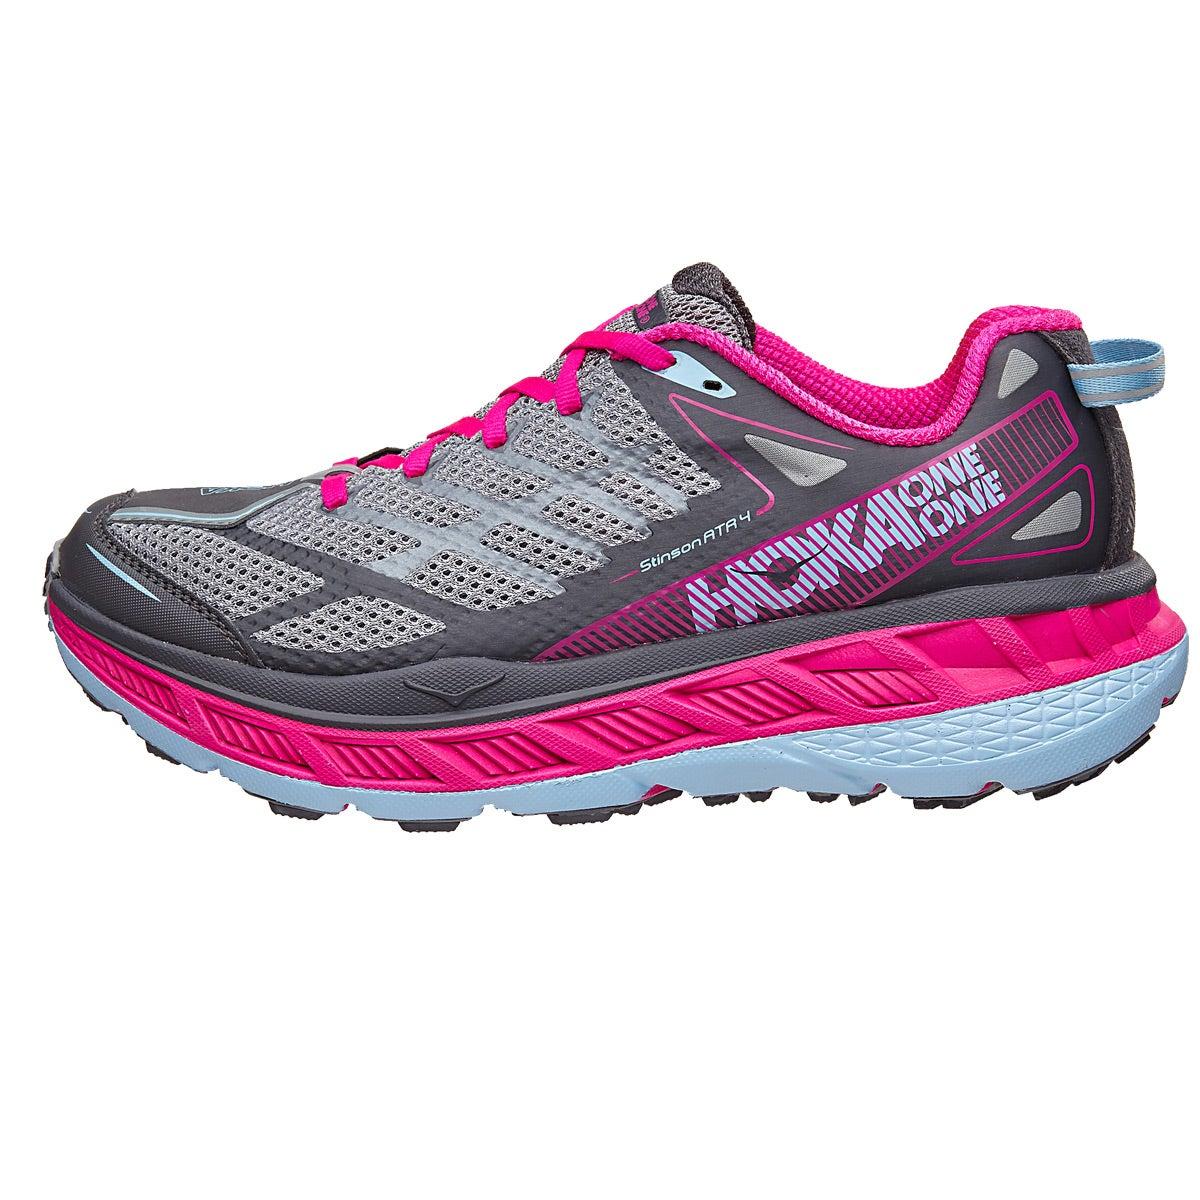 Running Shoes For Asphalt